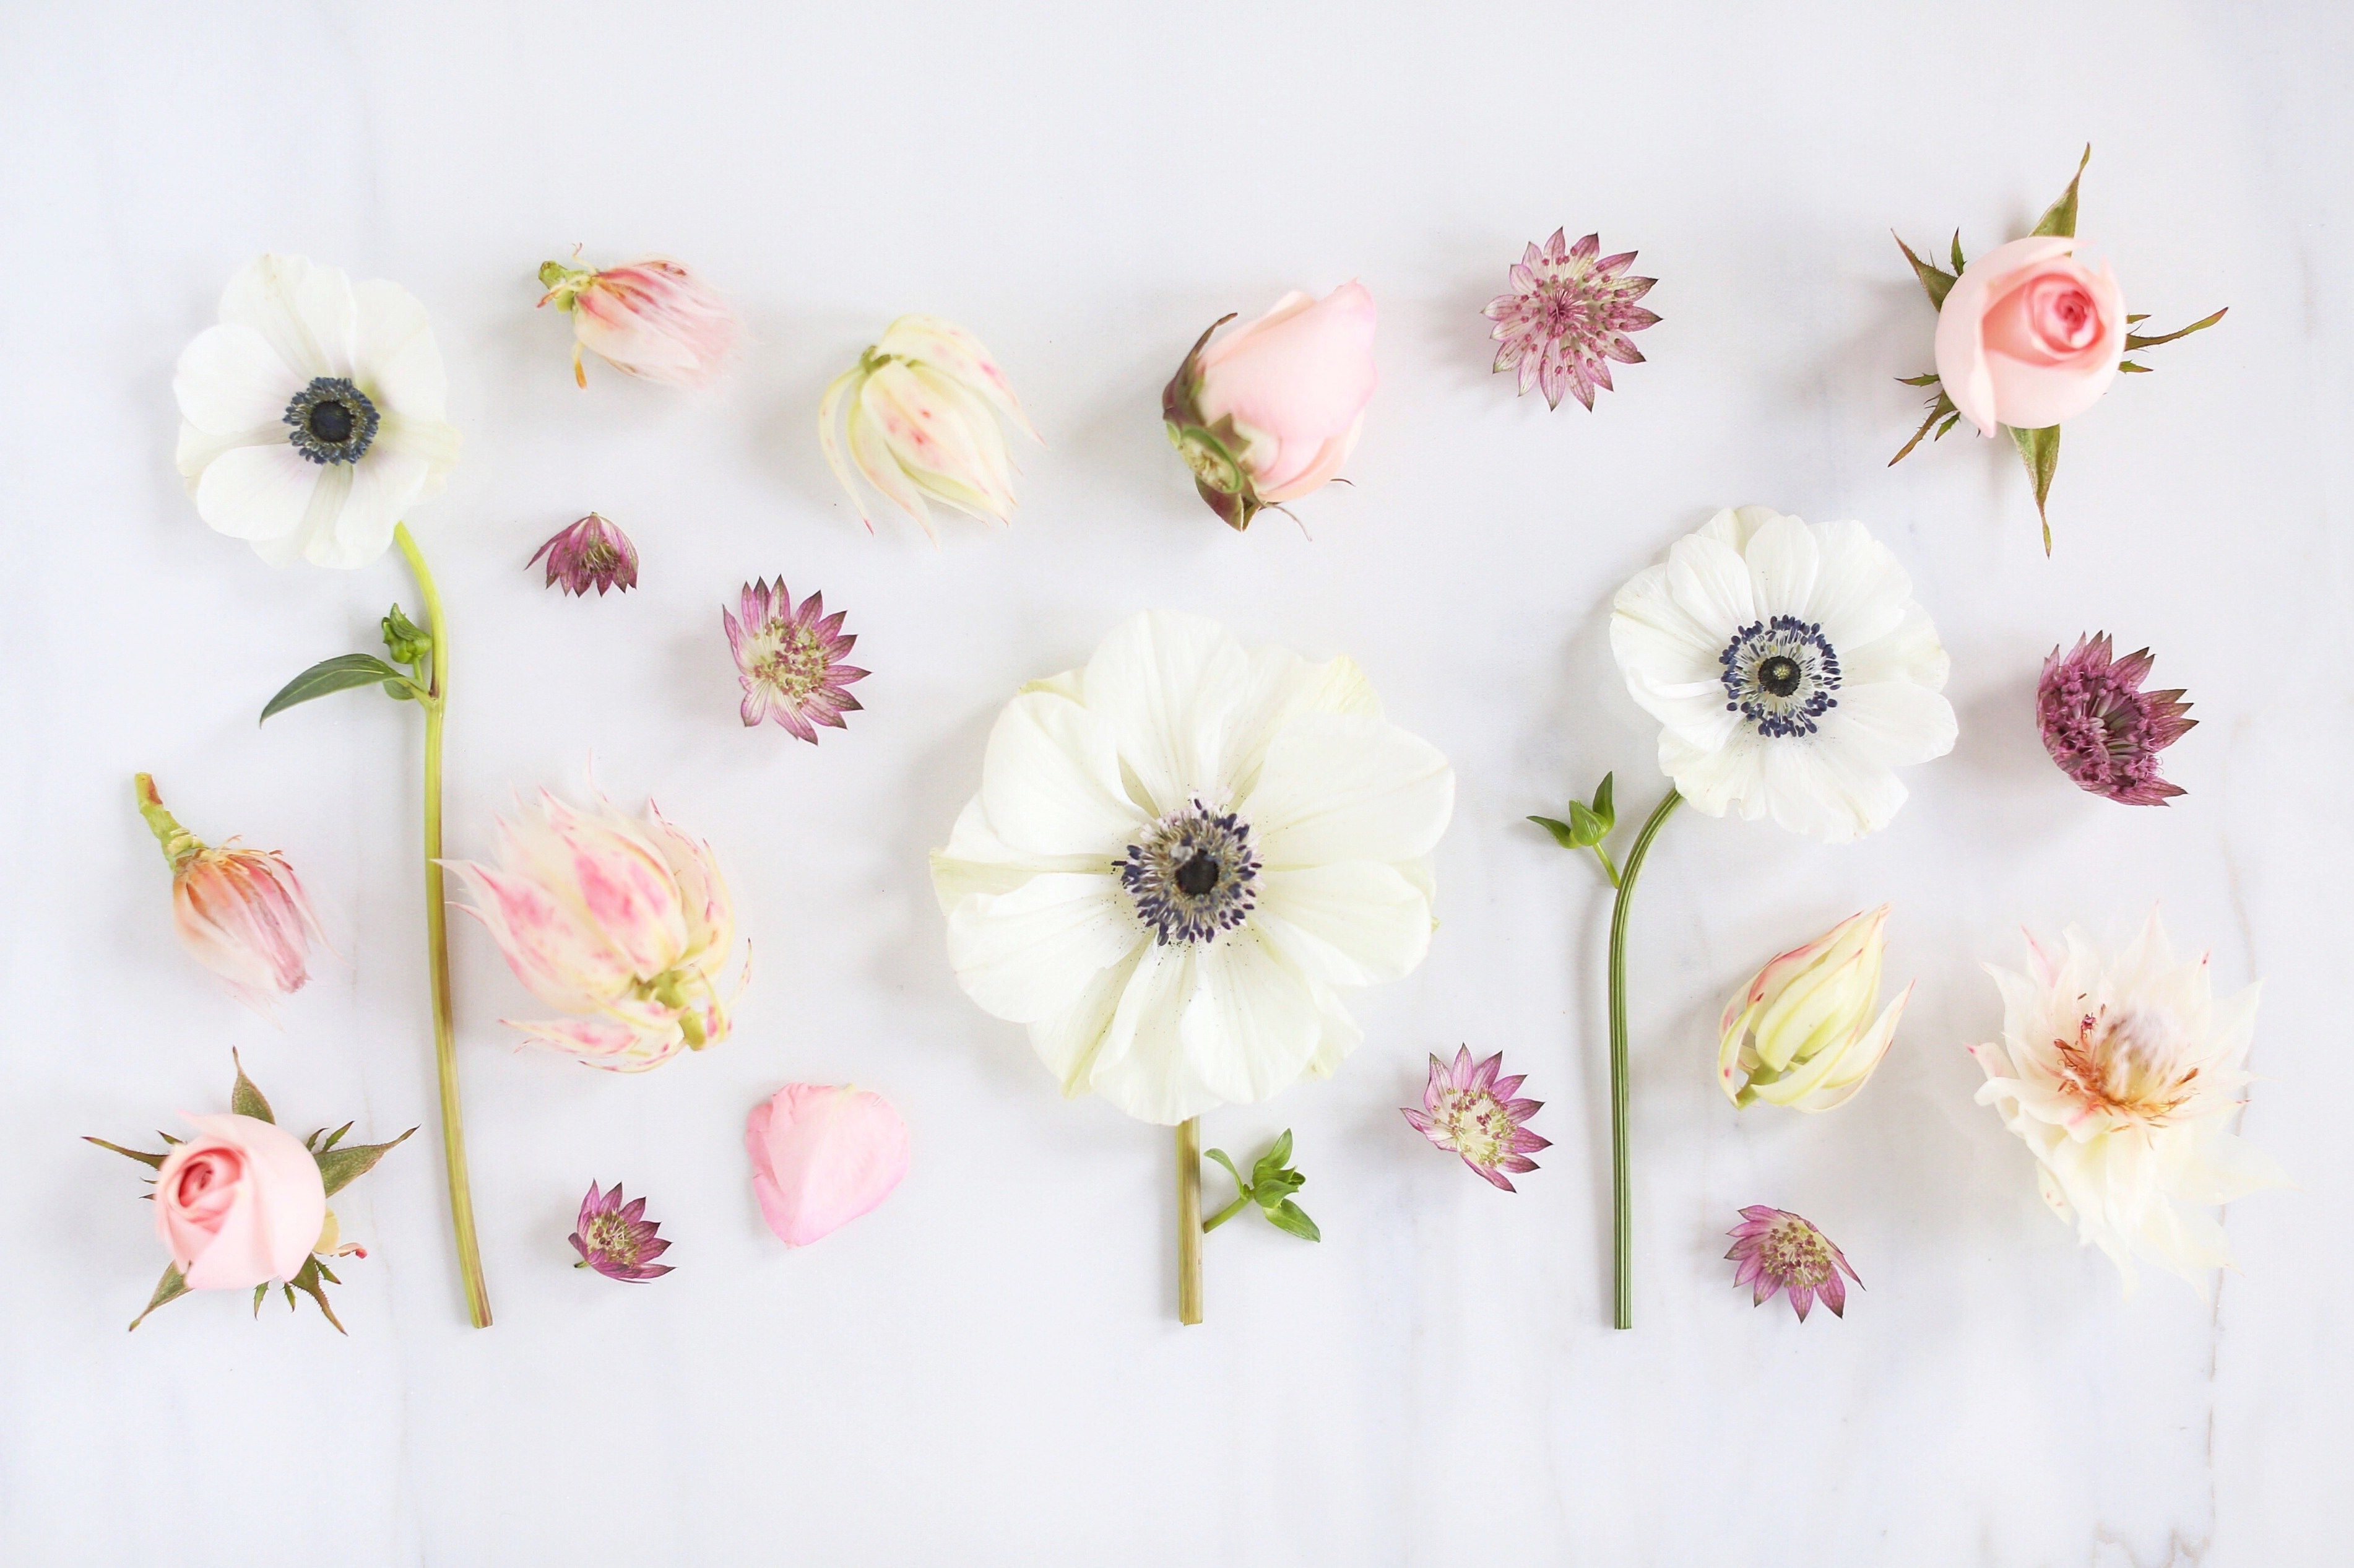 Minimalist Pastel Desktop Plant Wallpapers - Wallpaper Cave